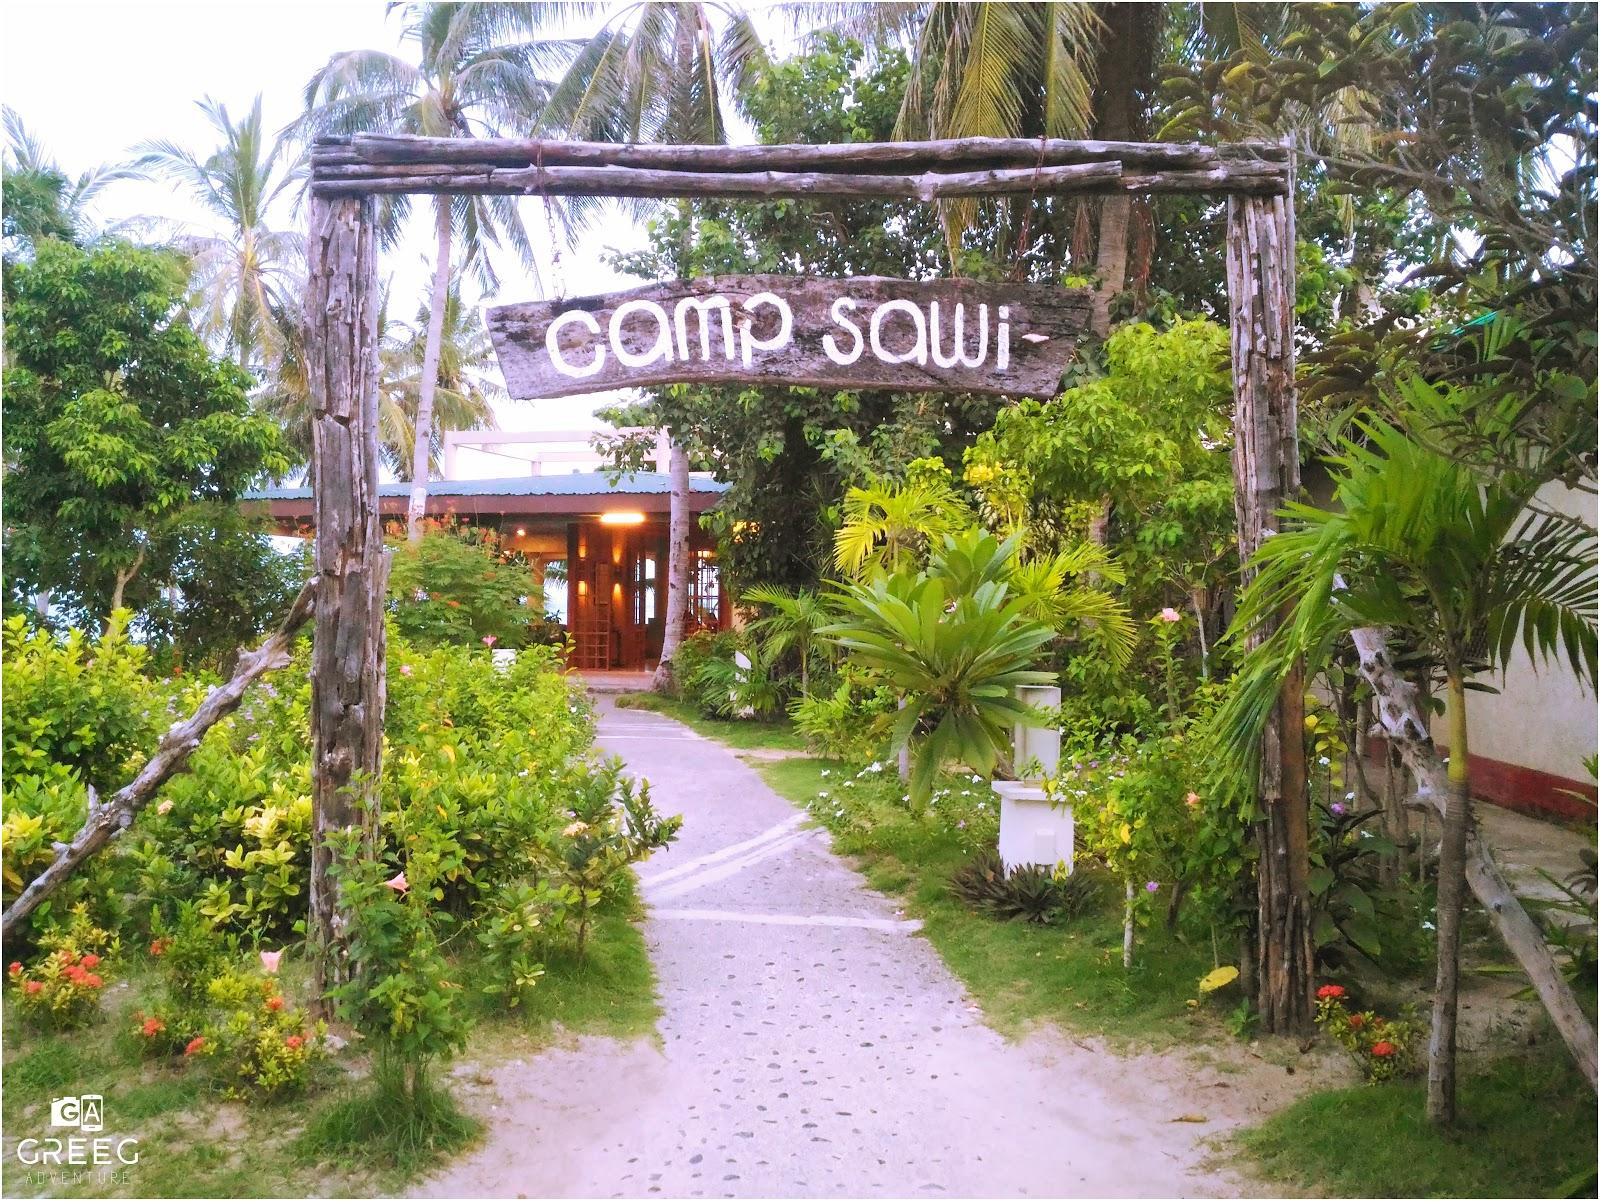 Kota Beach Resort Camp Sawi